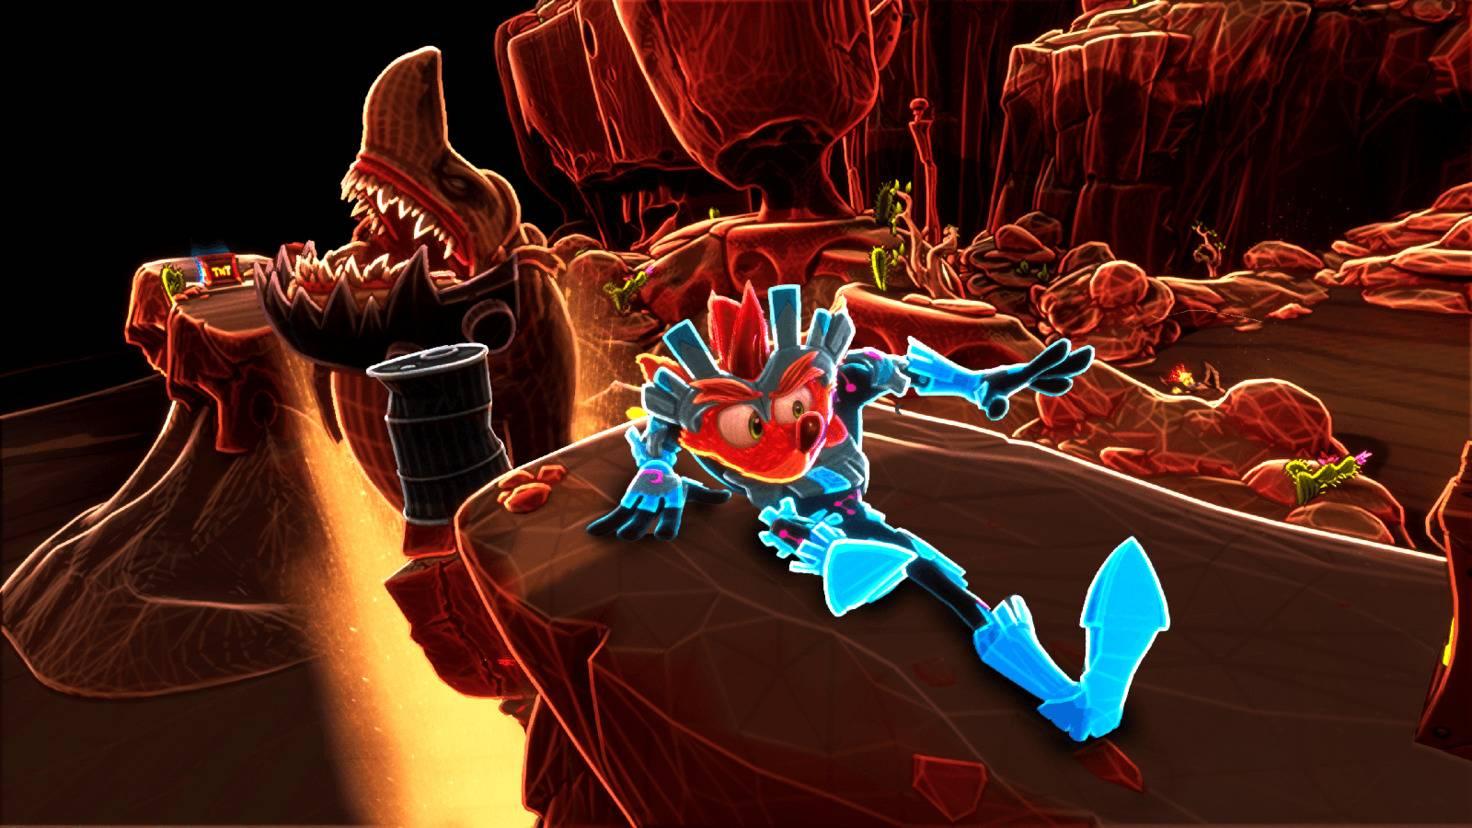 Crash Bandicoot 4 N. Verted